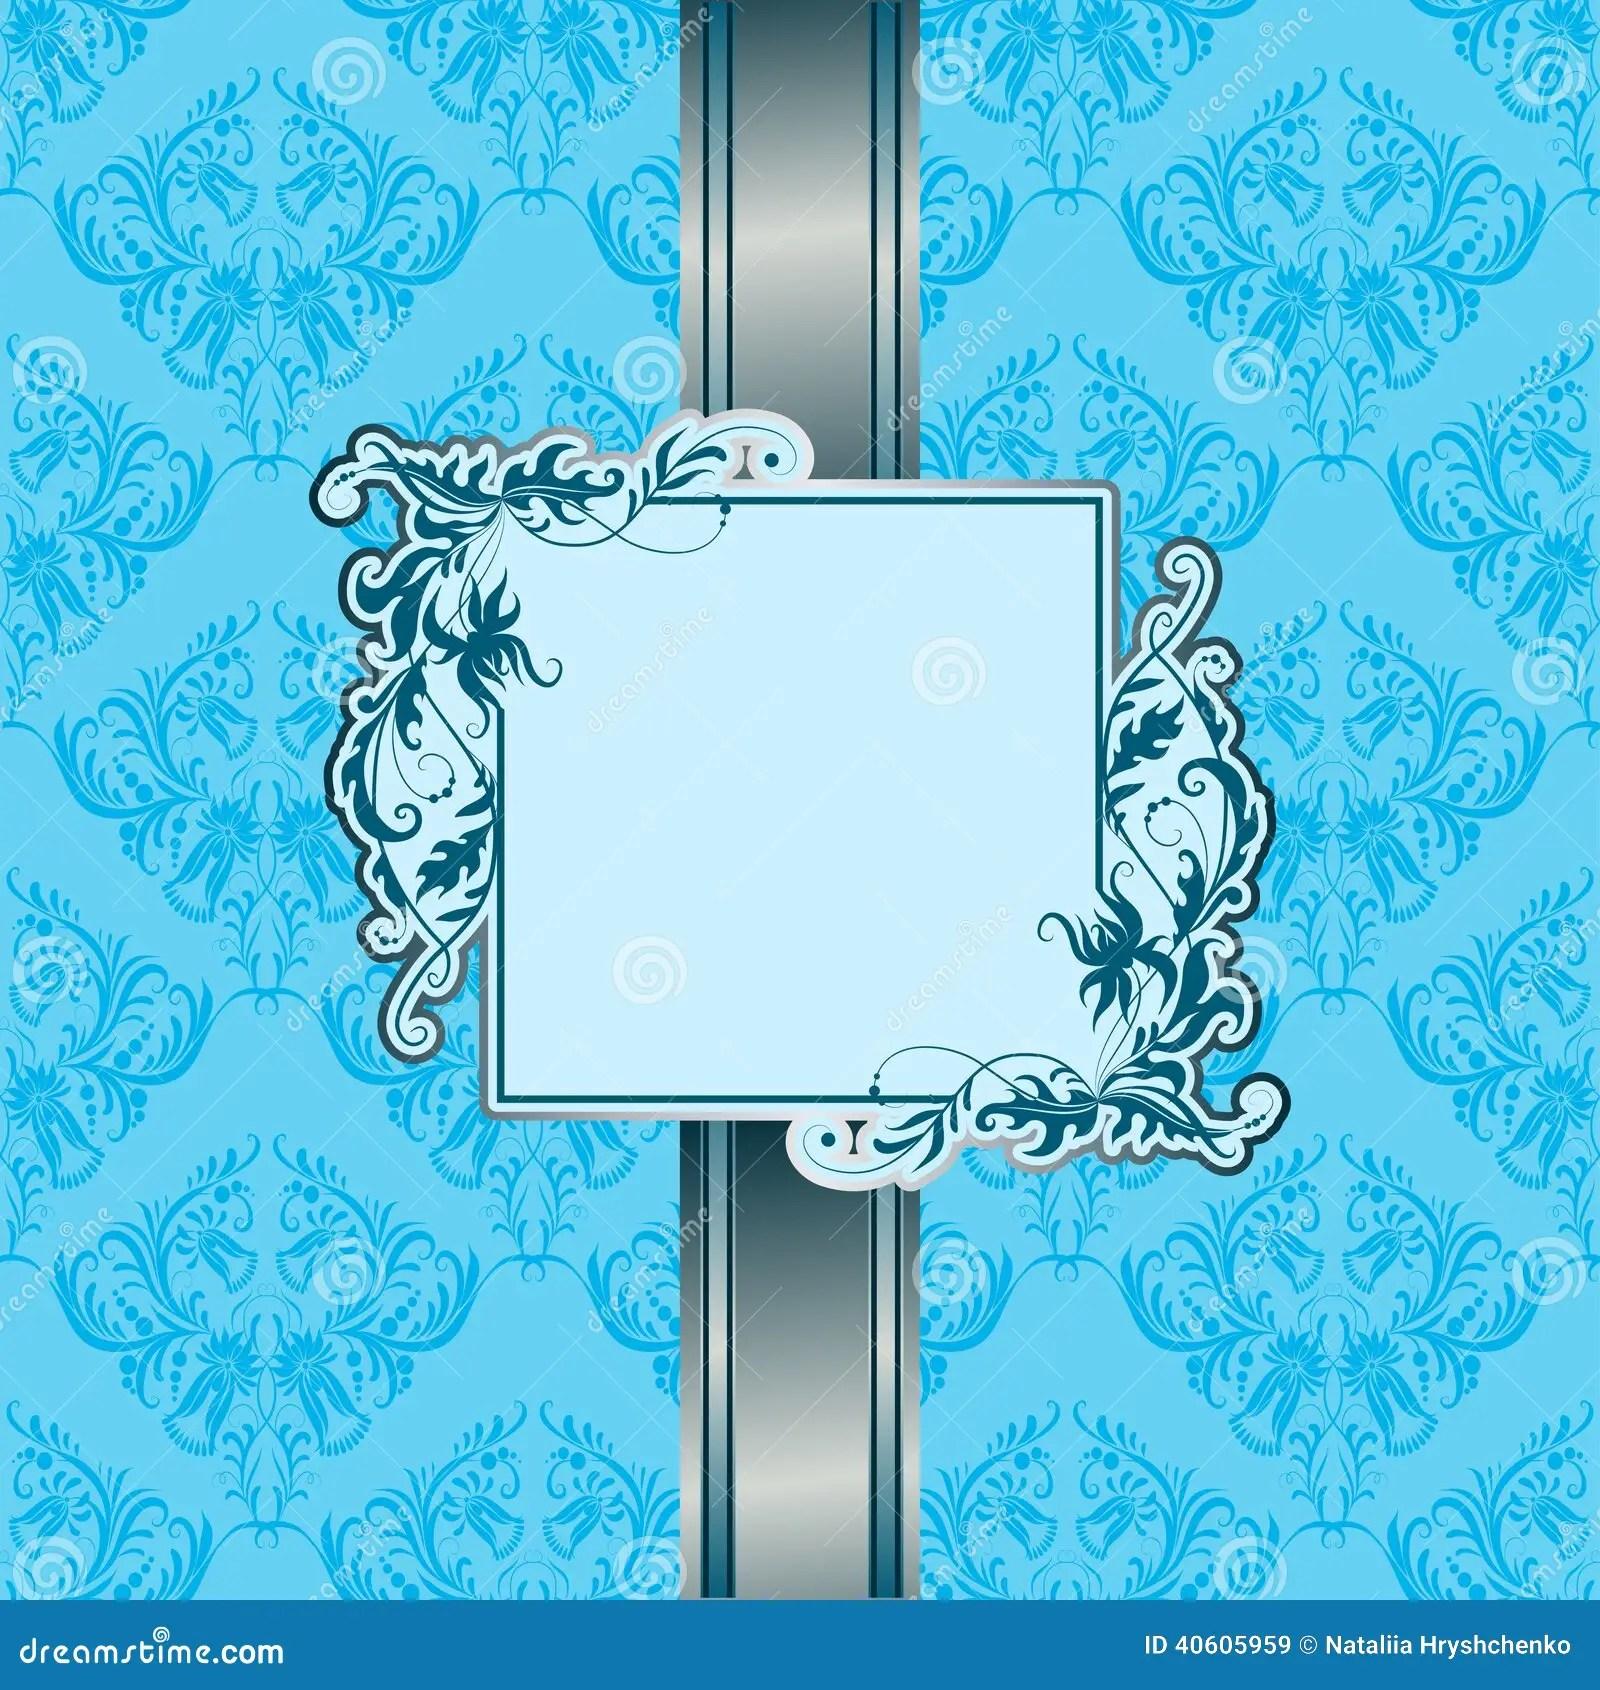 vintage invitation card on seamless background stock vector illustration of gift design 40605959